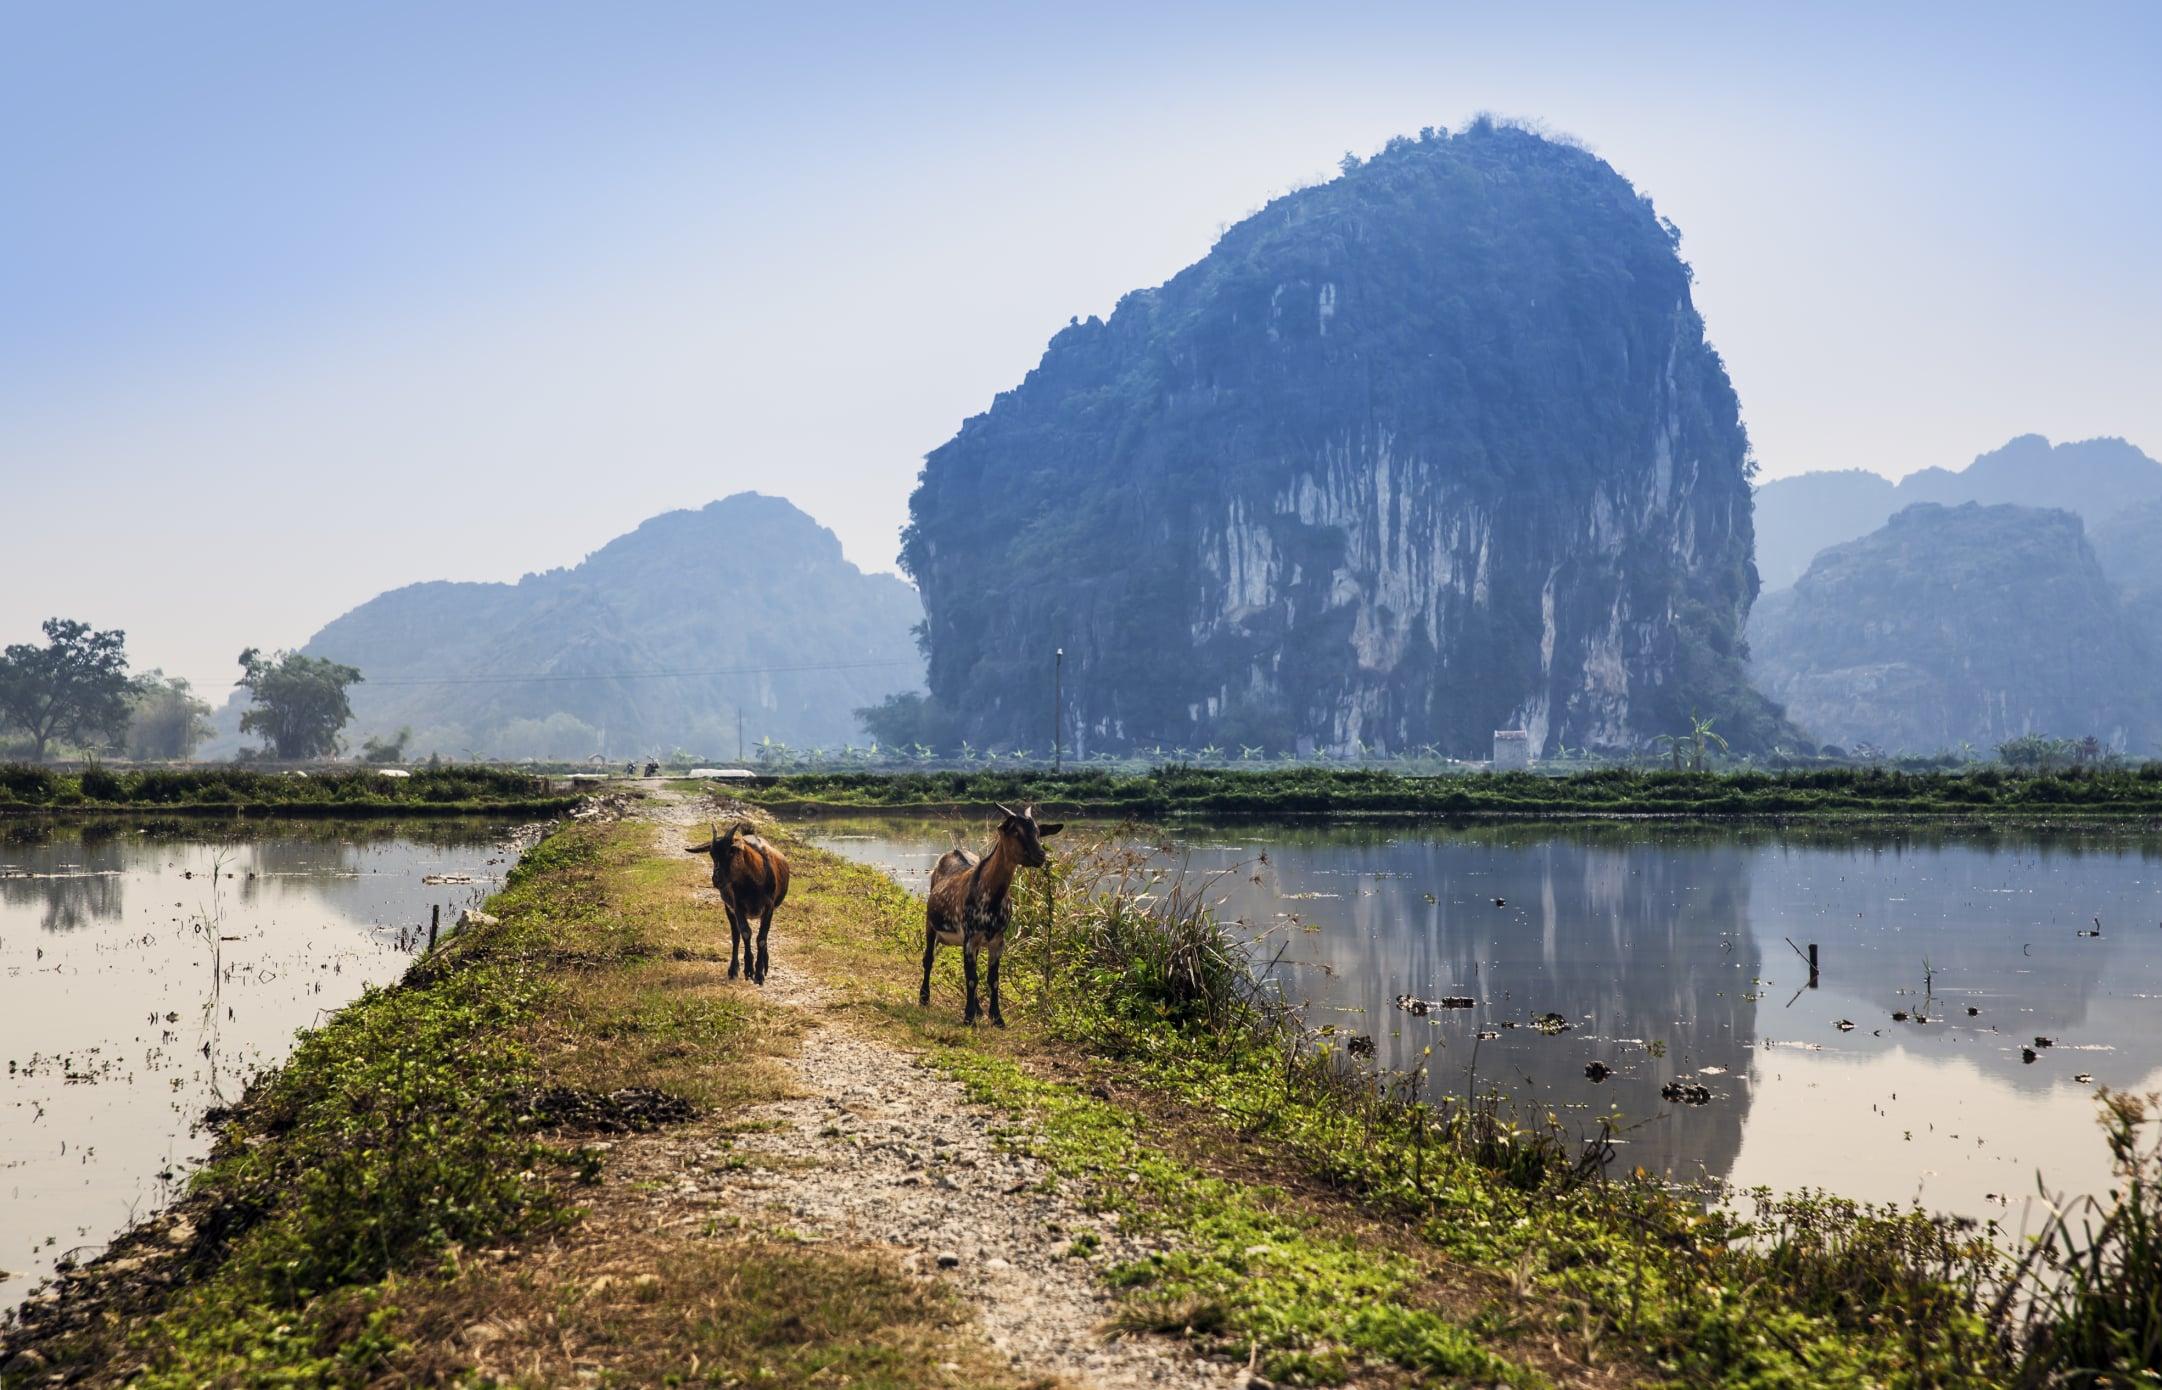 Mekongdelta - Vietnam Erfahrungsbericht